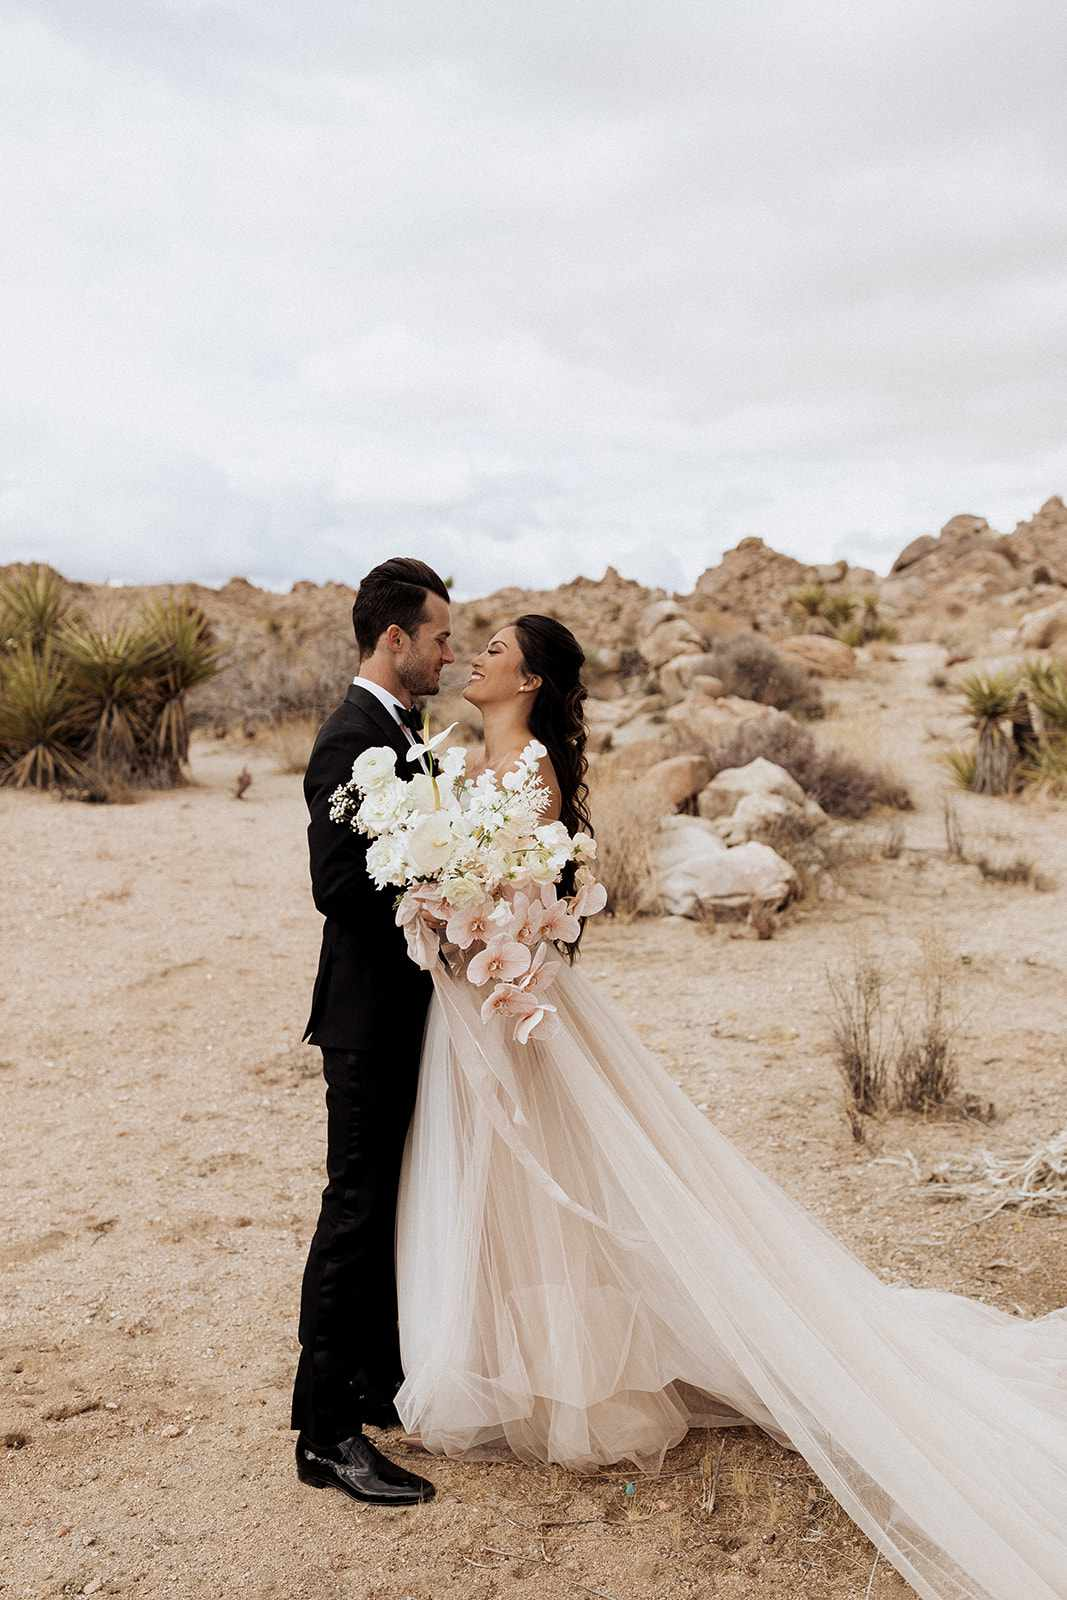 Couple with long stem bouquet